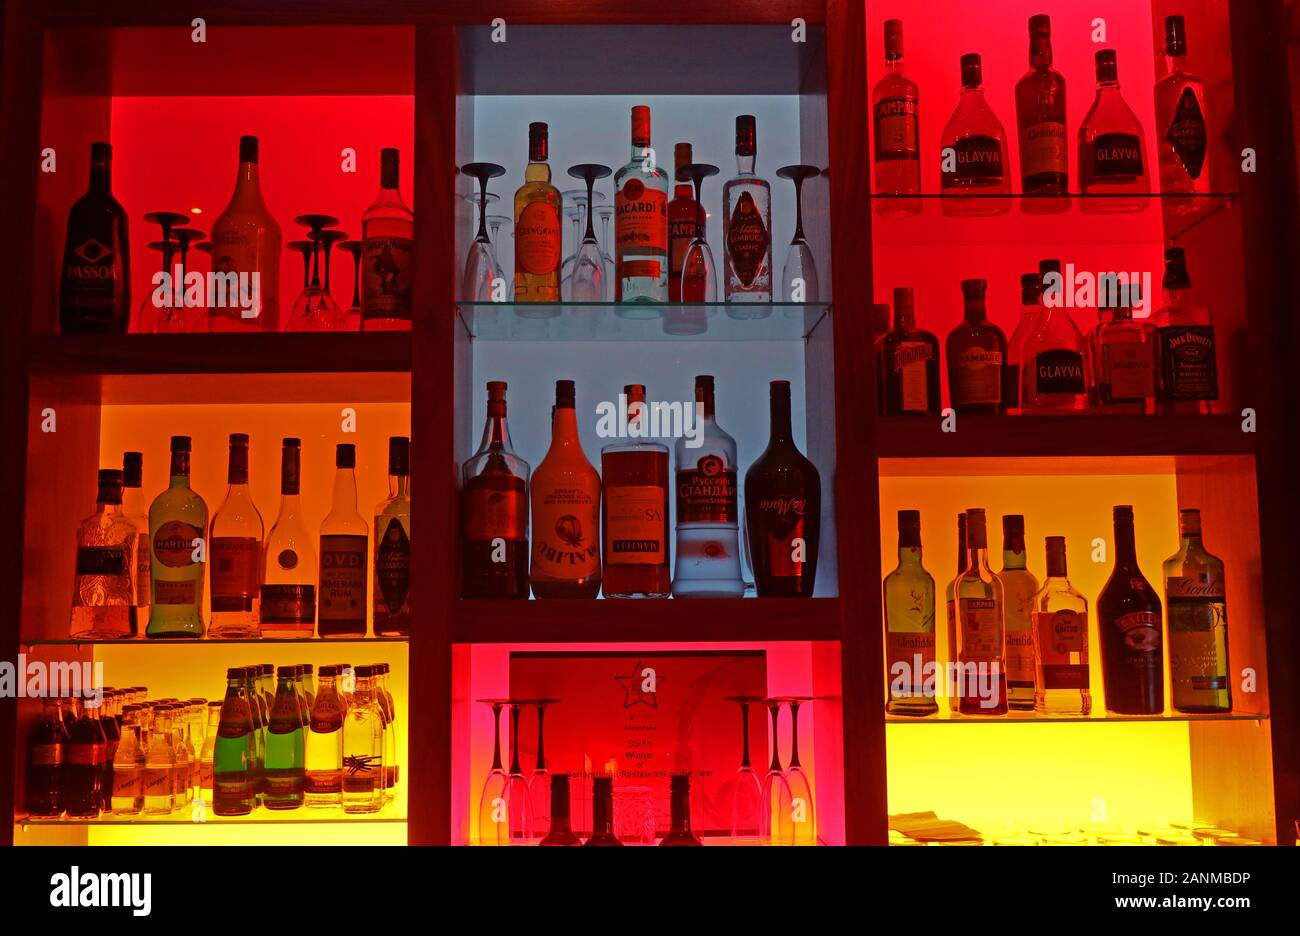 Edinburgh,HotpixUK,@HotpixUK,GoTonySmith,drinking,abuse,Alcohol,bright,attractive bar,multicoloured backlit bar,multicoloured,backlit,Whisky,Brandy,Liquors,bitters,mixers,fun bar,red,blue,yellow,orange,nightlife,club,tempting,temptation,fancy a drink,have a drink,bottles,bottles of spirits,drink,drinks,beverage,bourbon,fun,background,elegant